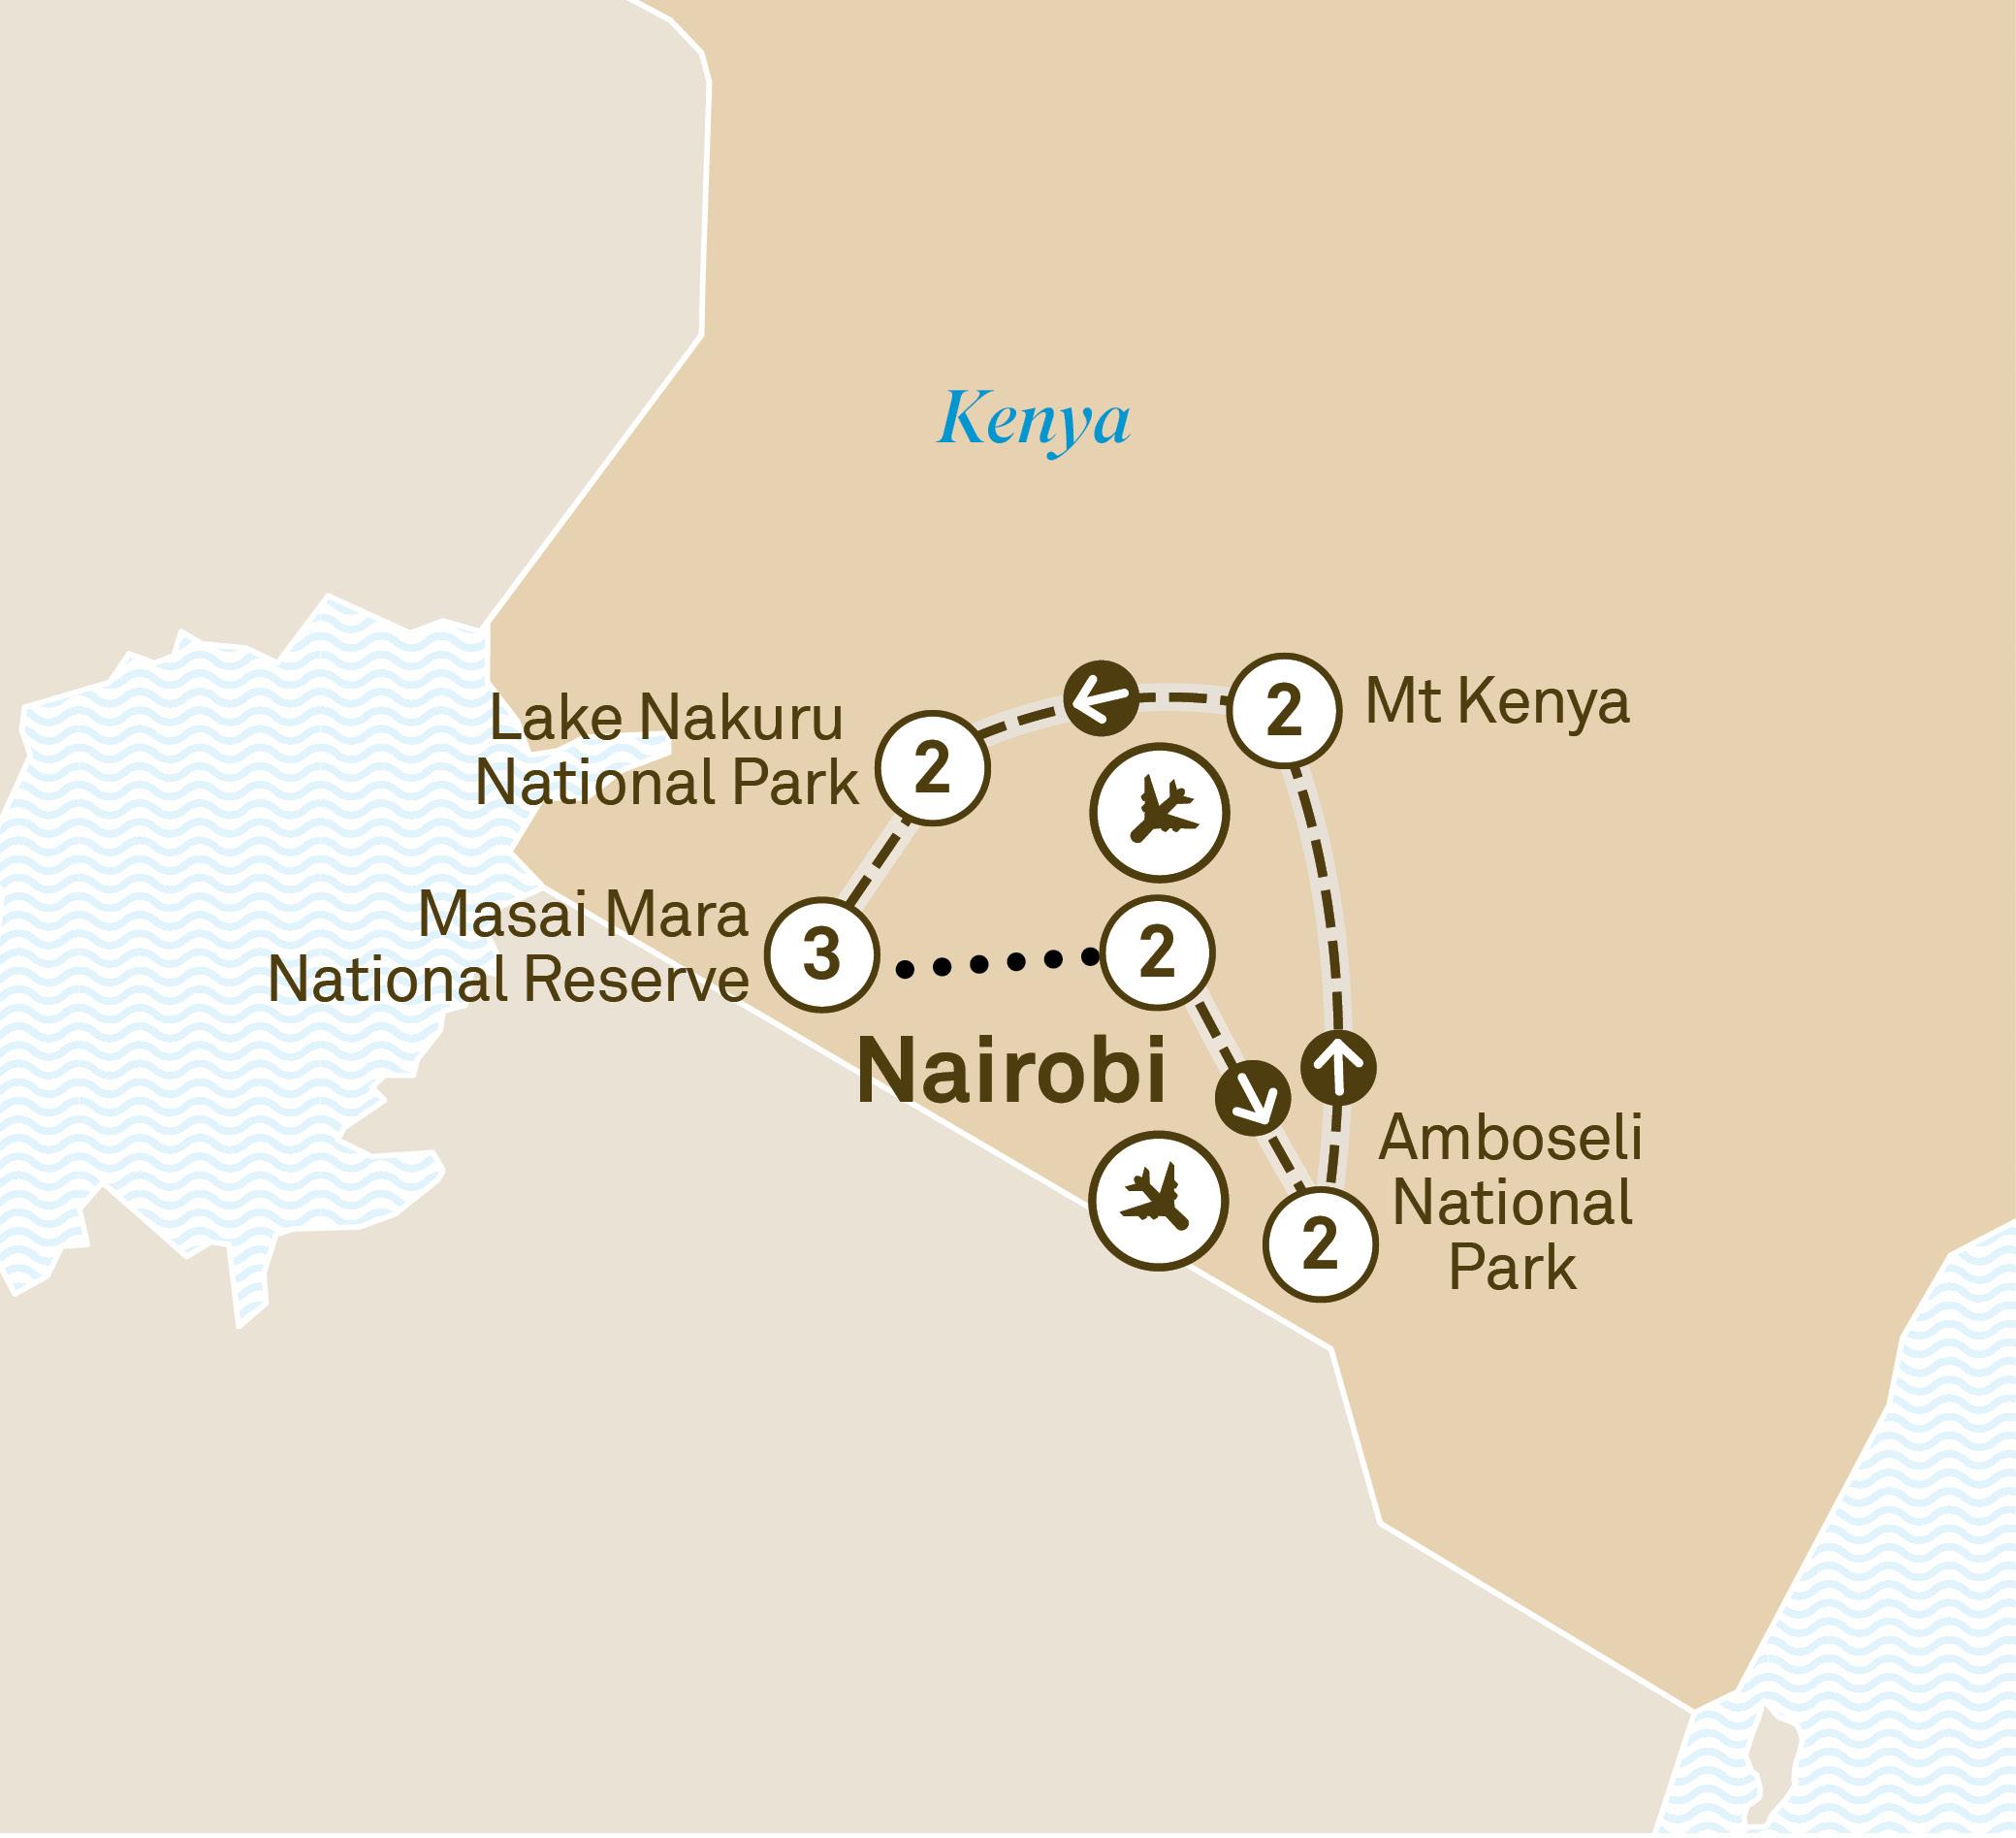 Kenyan Discovery